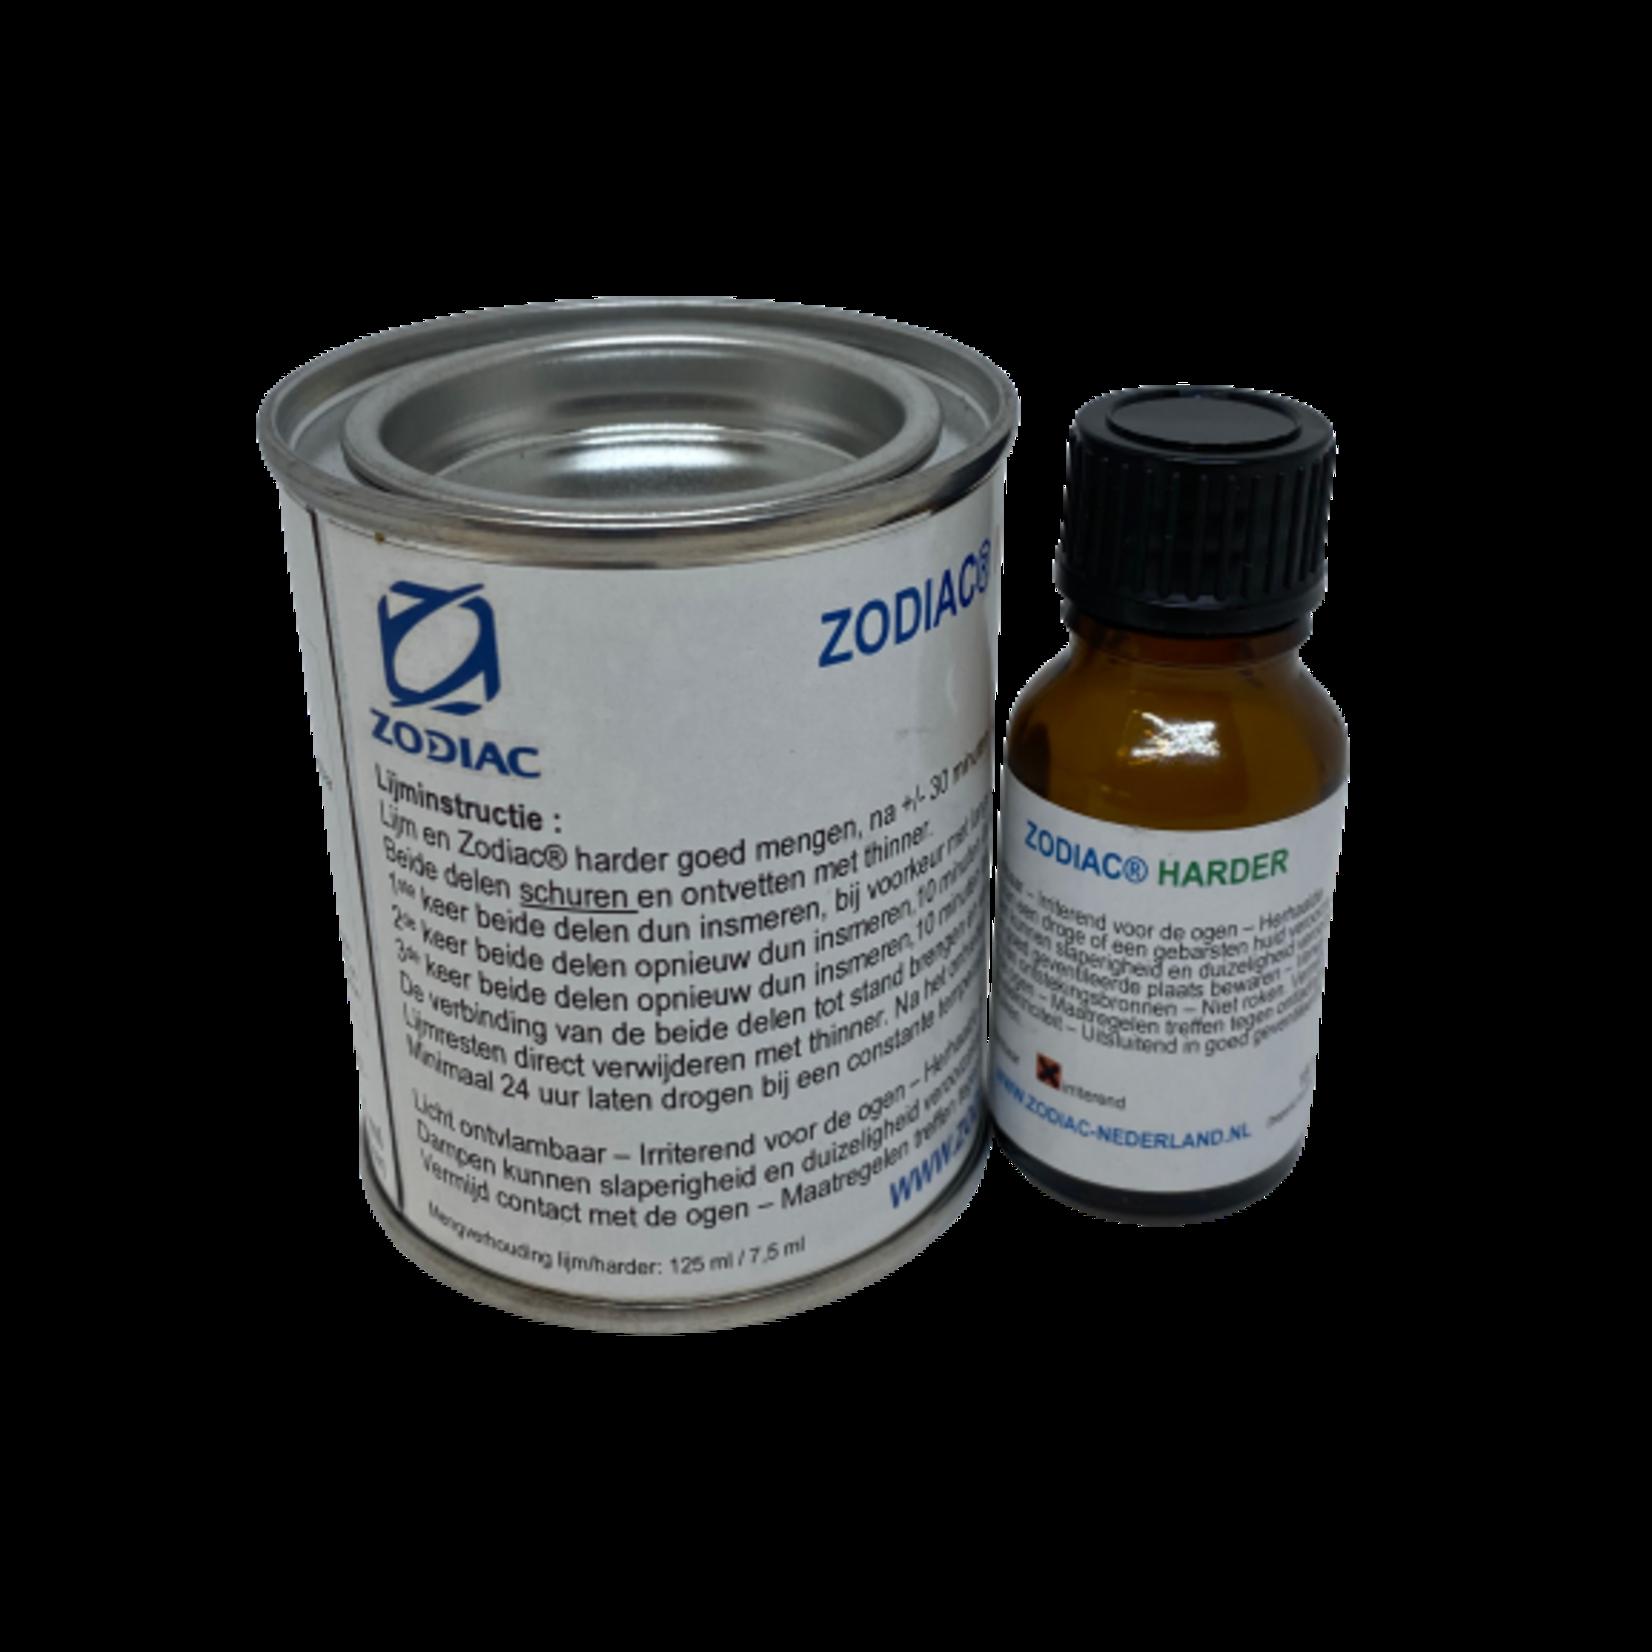 Zodiac Zodiac Neoprene Hypalon glue 2-components 125ml